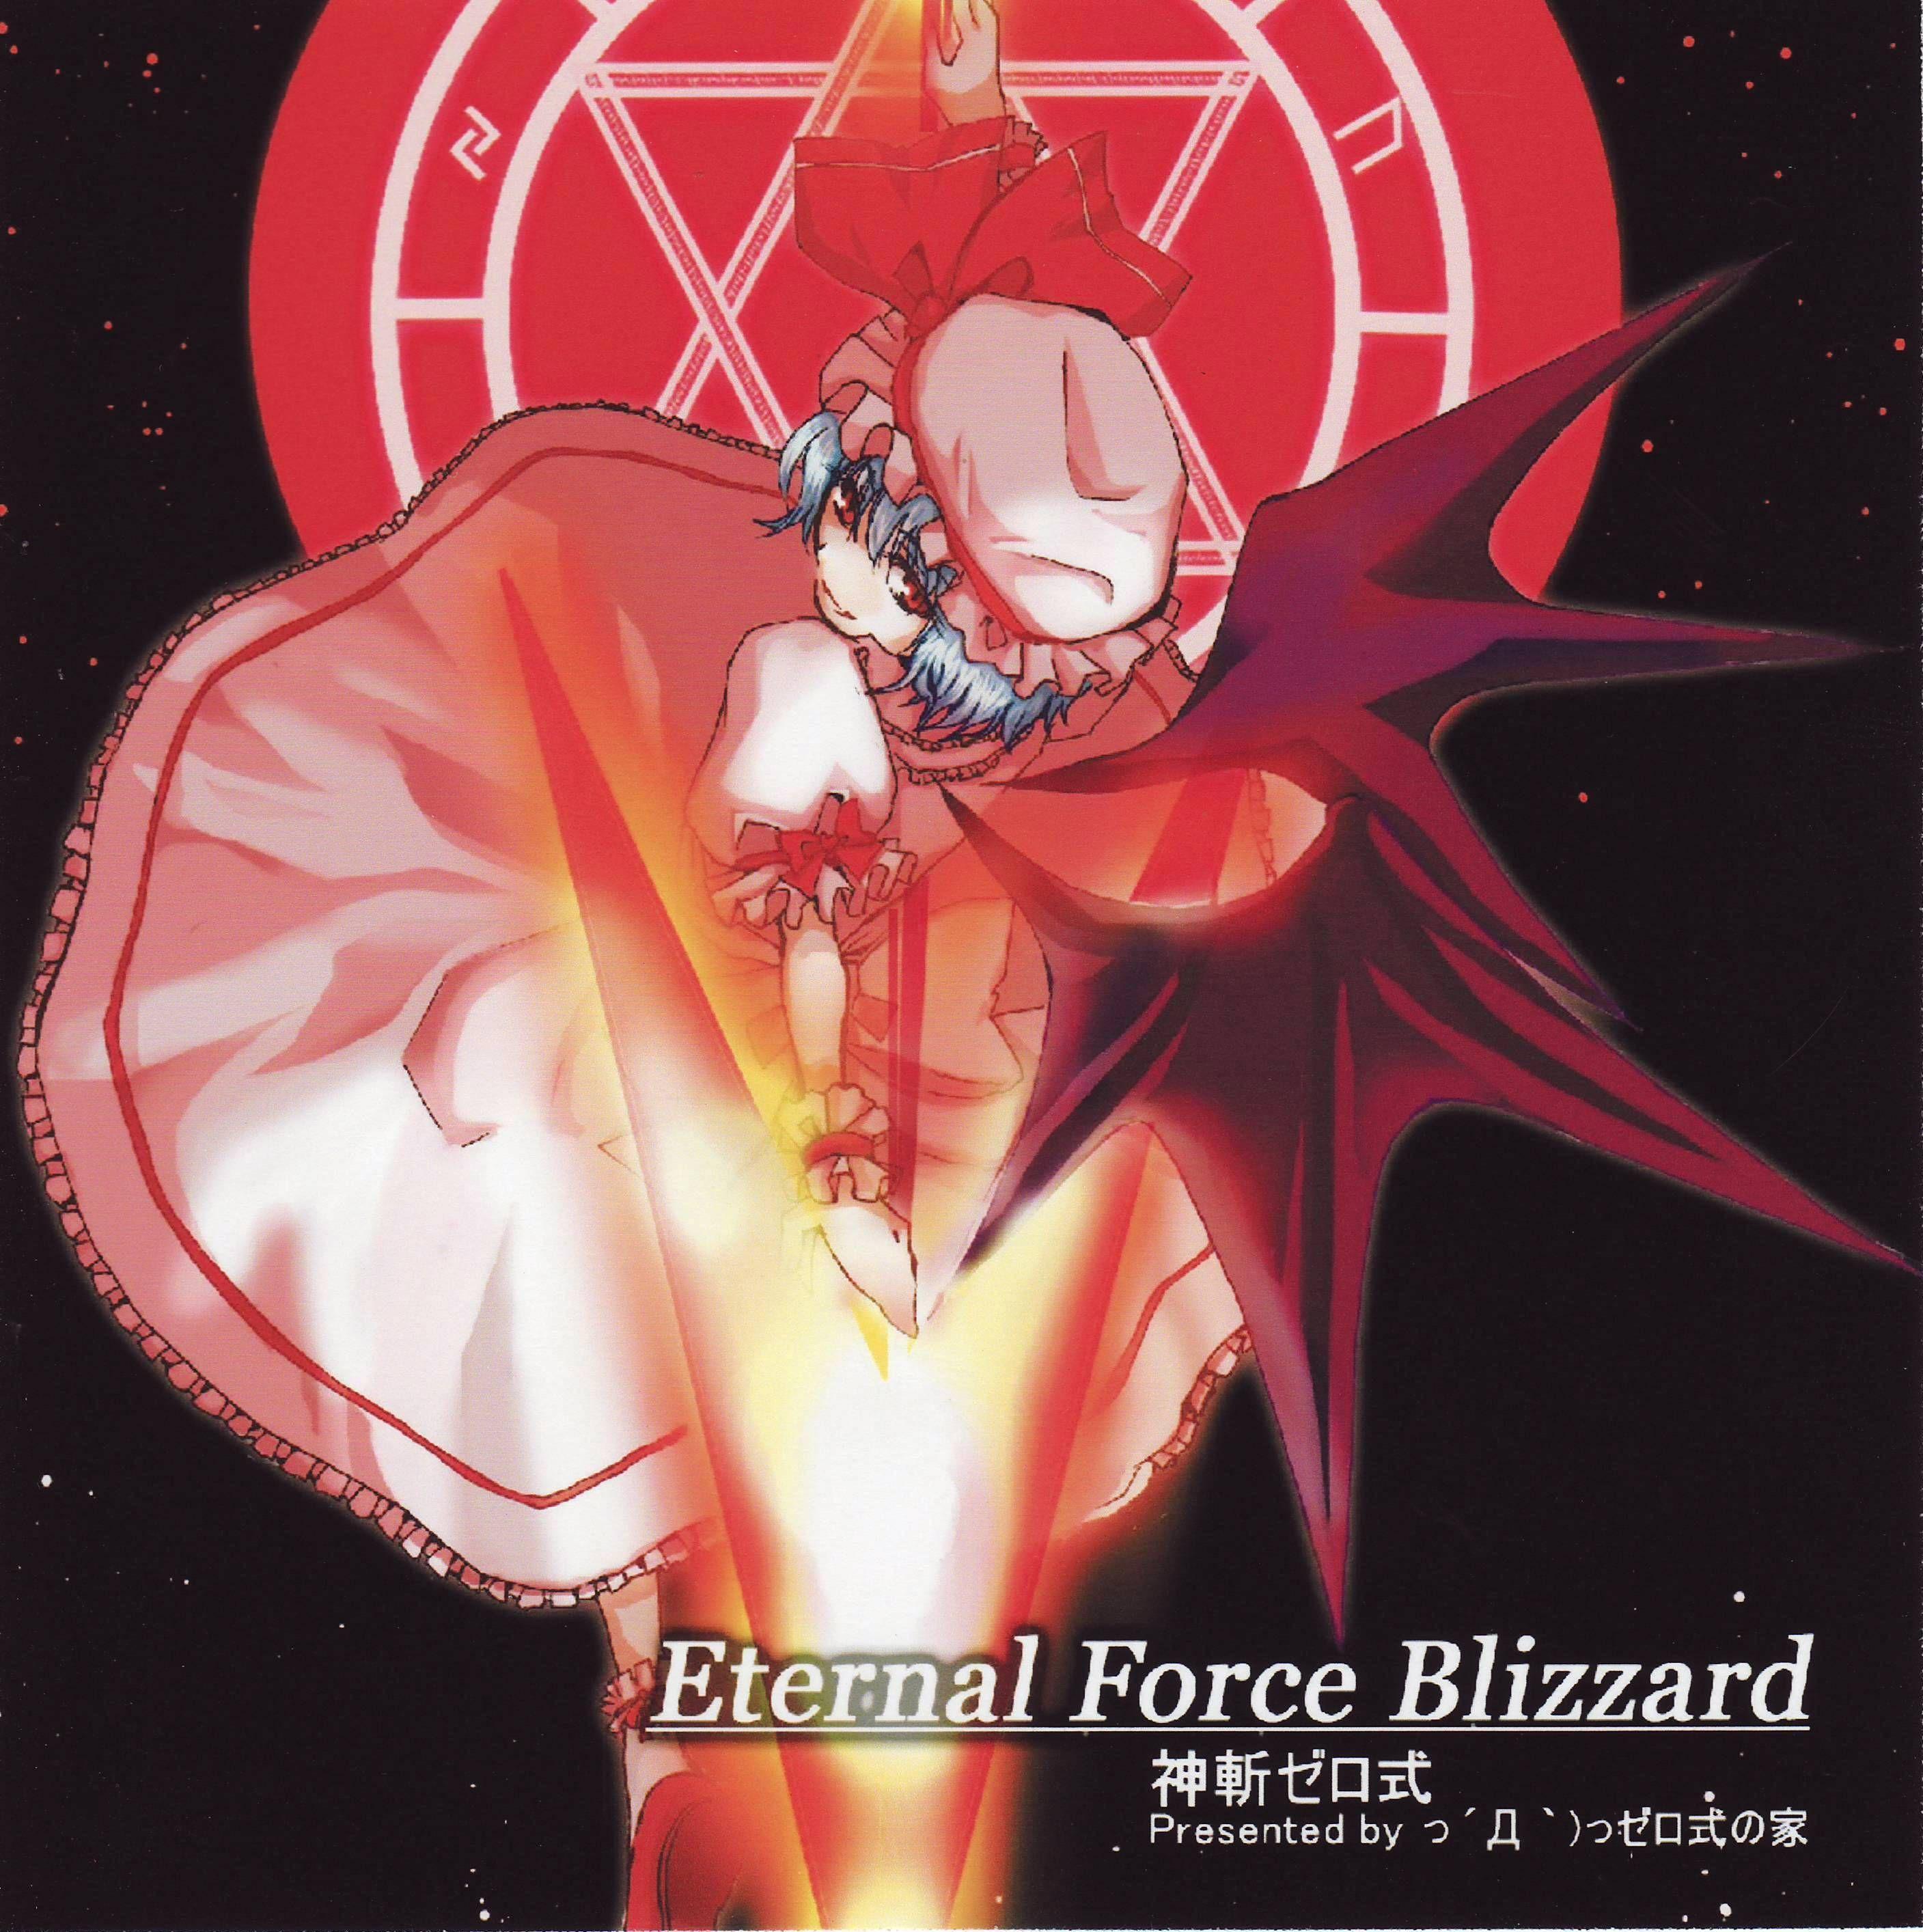 Eternal Force Blizzard